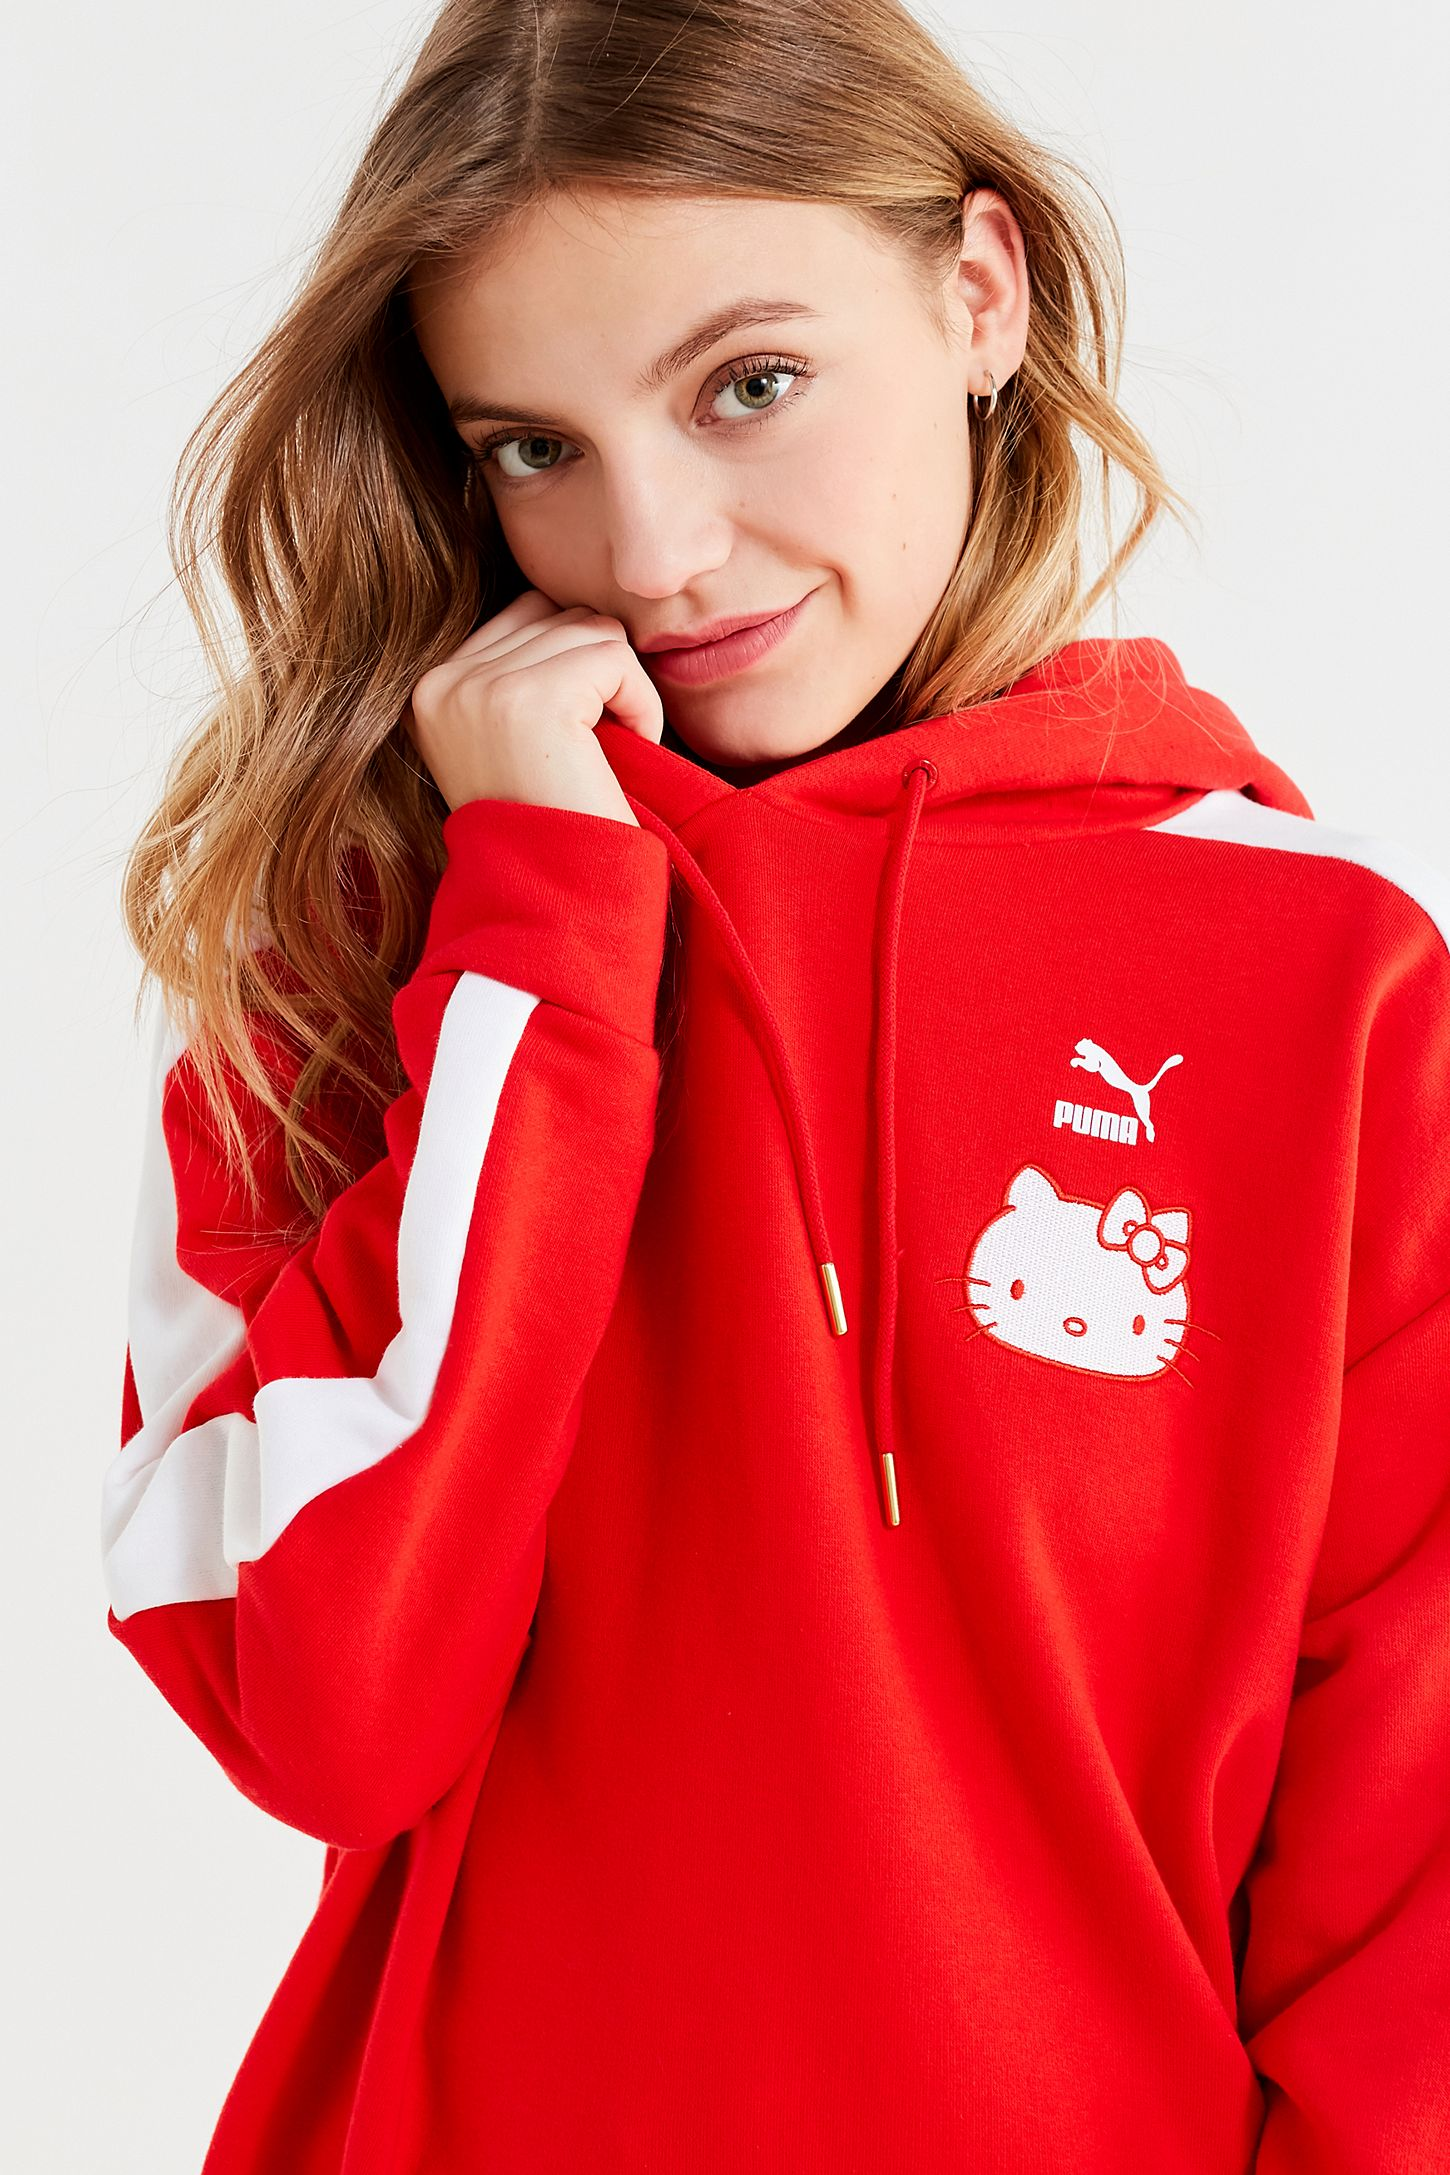 409b879de0cafc Puma X Hello Kitty Hoodie Sweatshirt